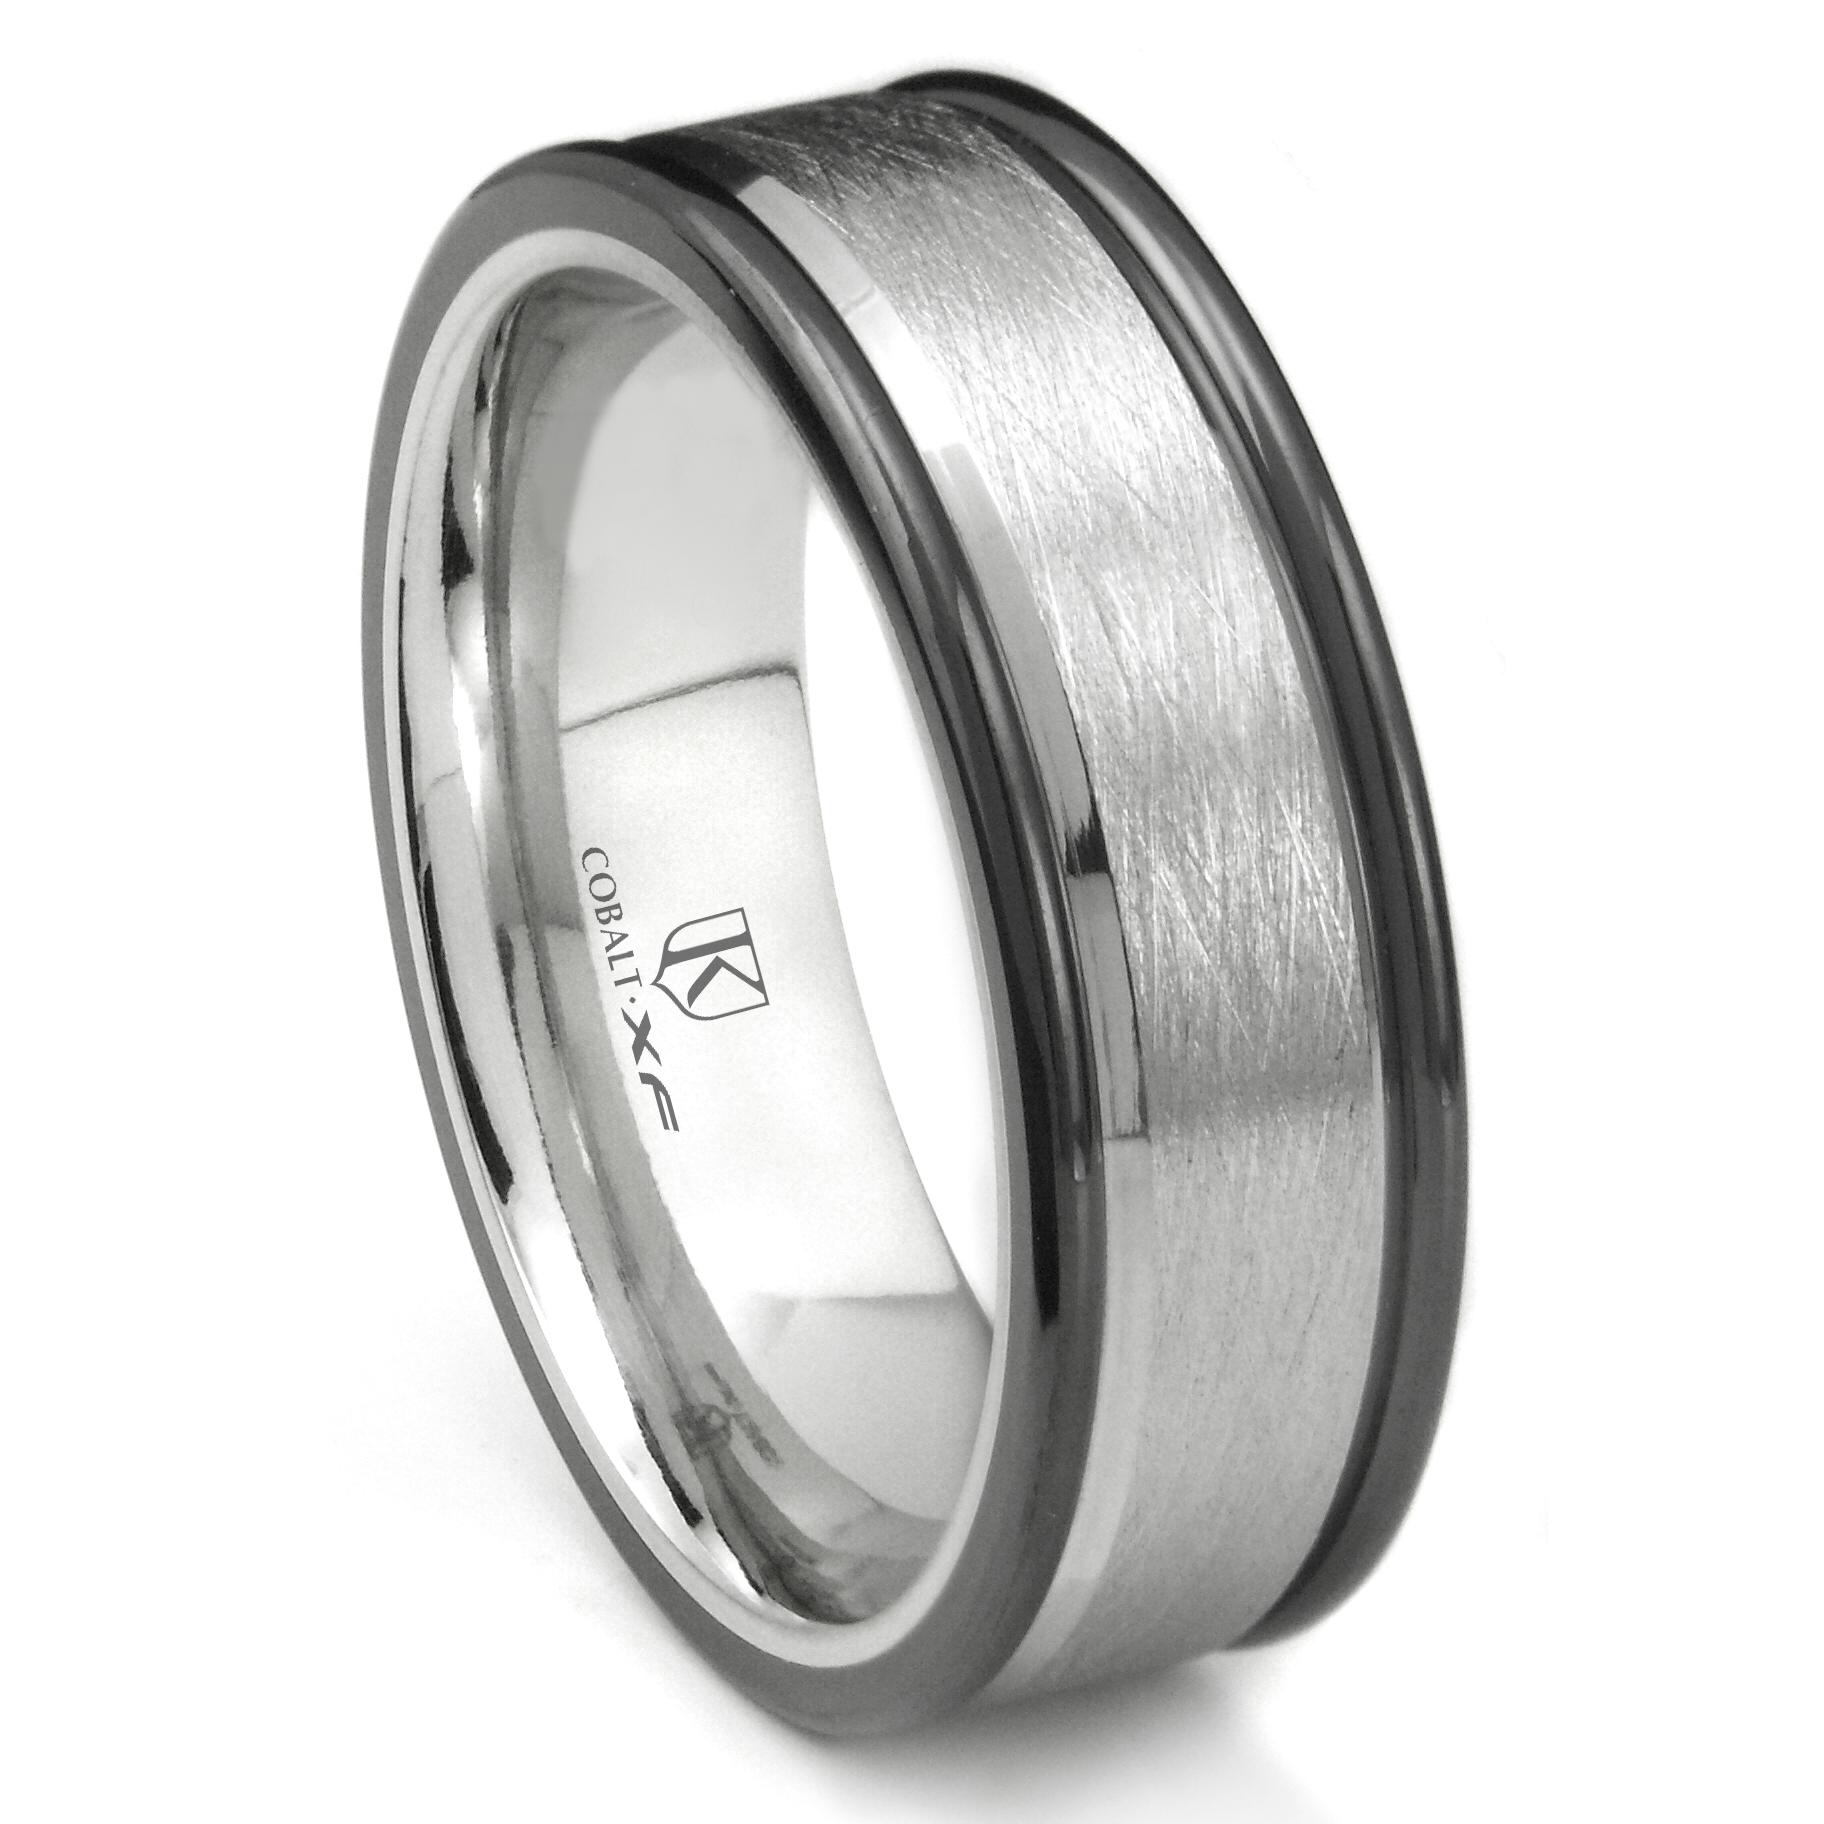 Cobalt XF Chrome 8MM Italian Di Seta Finish Two Tone Wedding Band Ring P cobalt wedding rings Home Cobalt Rings Loading zoom